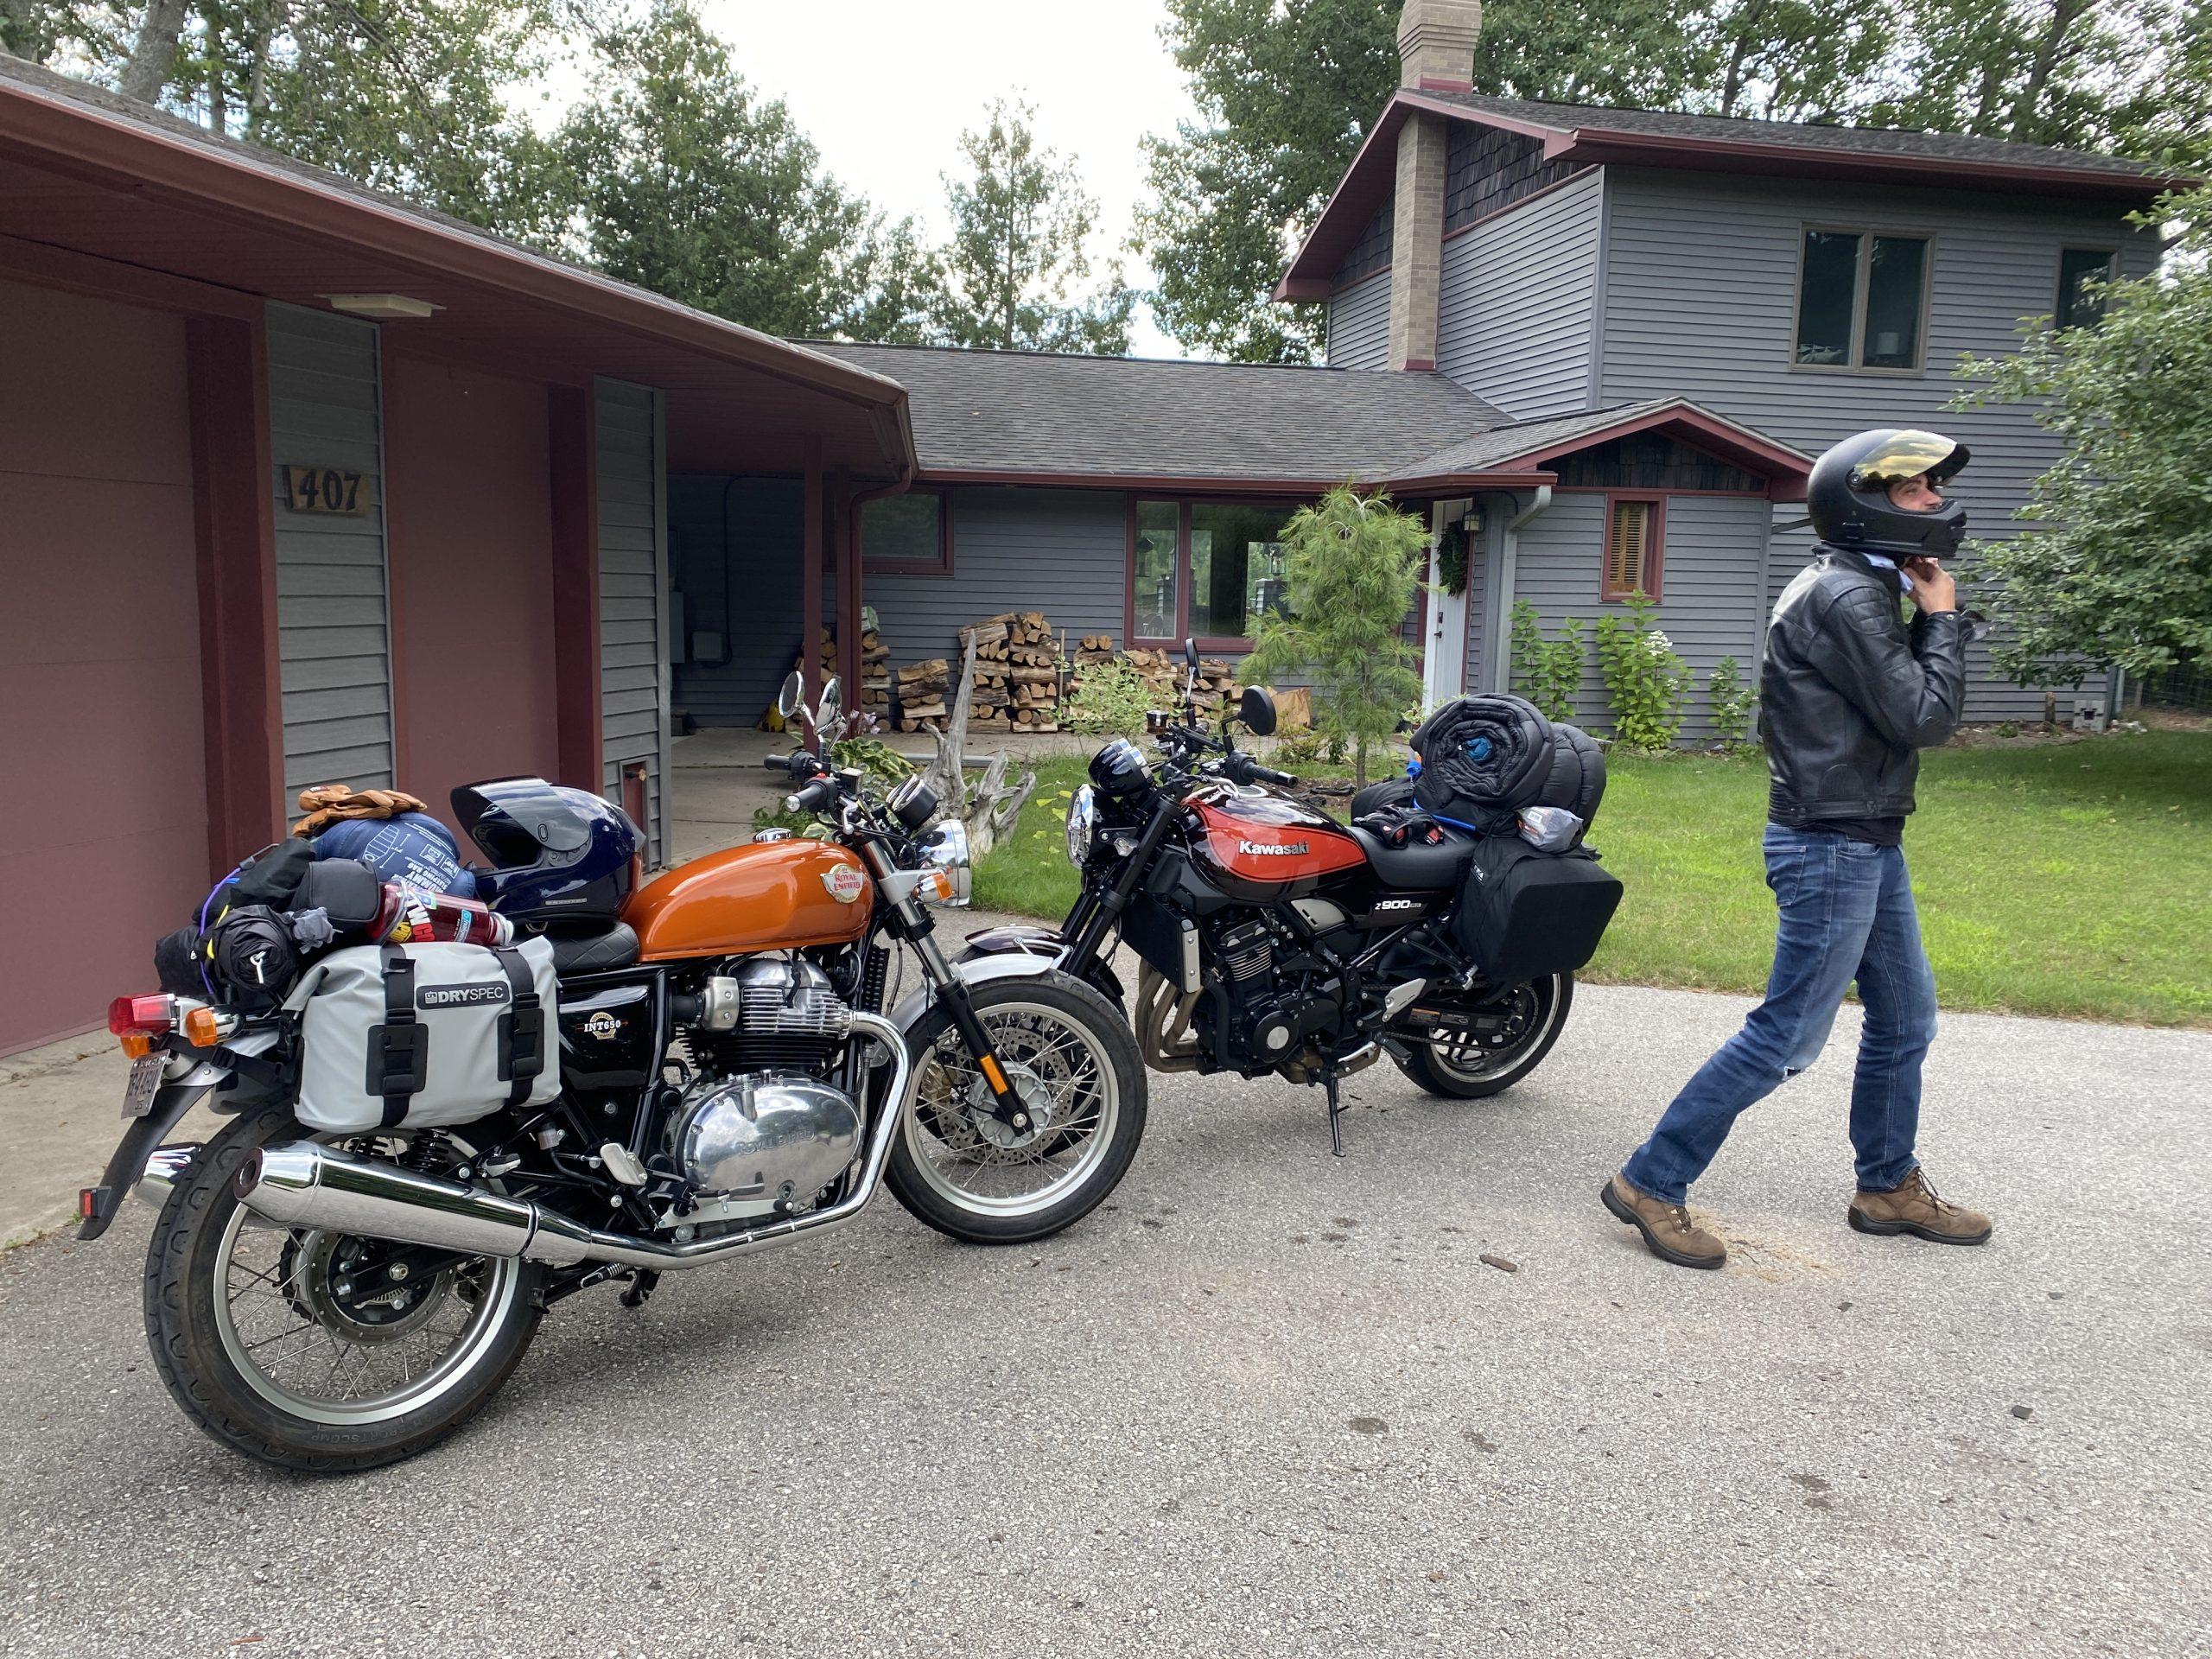 gingerman moto trip bikes with luggage 4